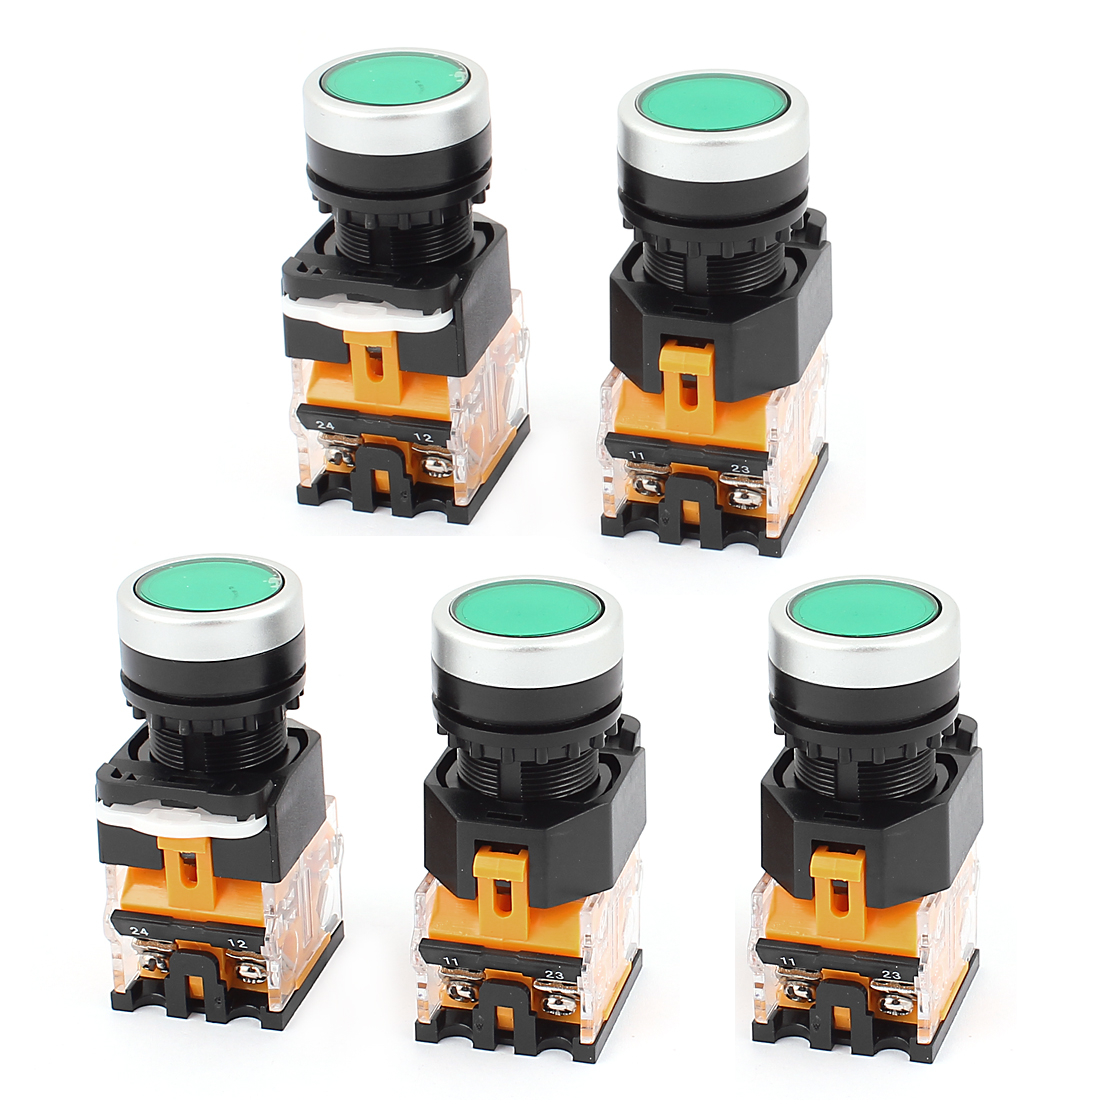 AC 660V 10A NO NC 4-Pin Momentary Green Push Button Switch 5PCS